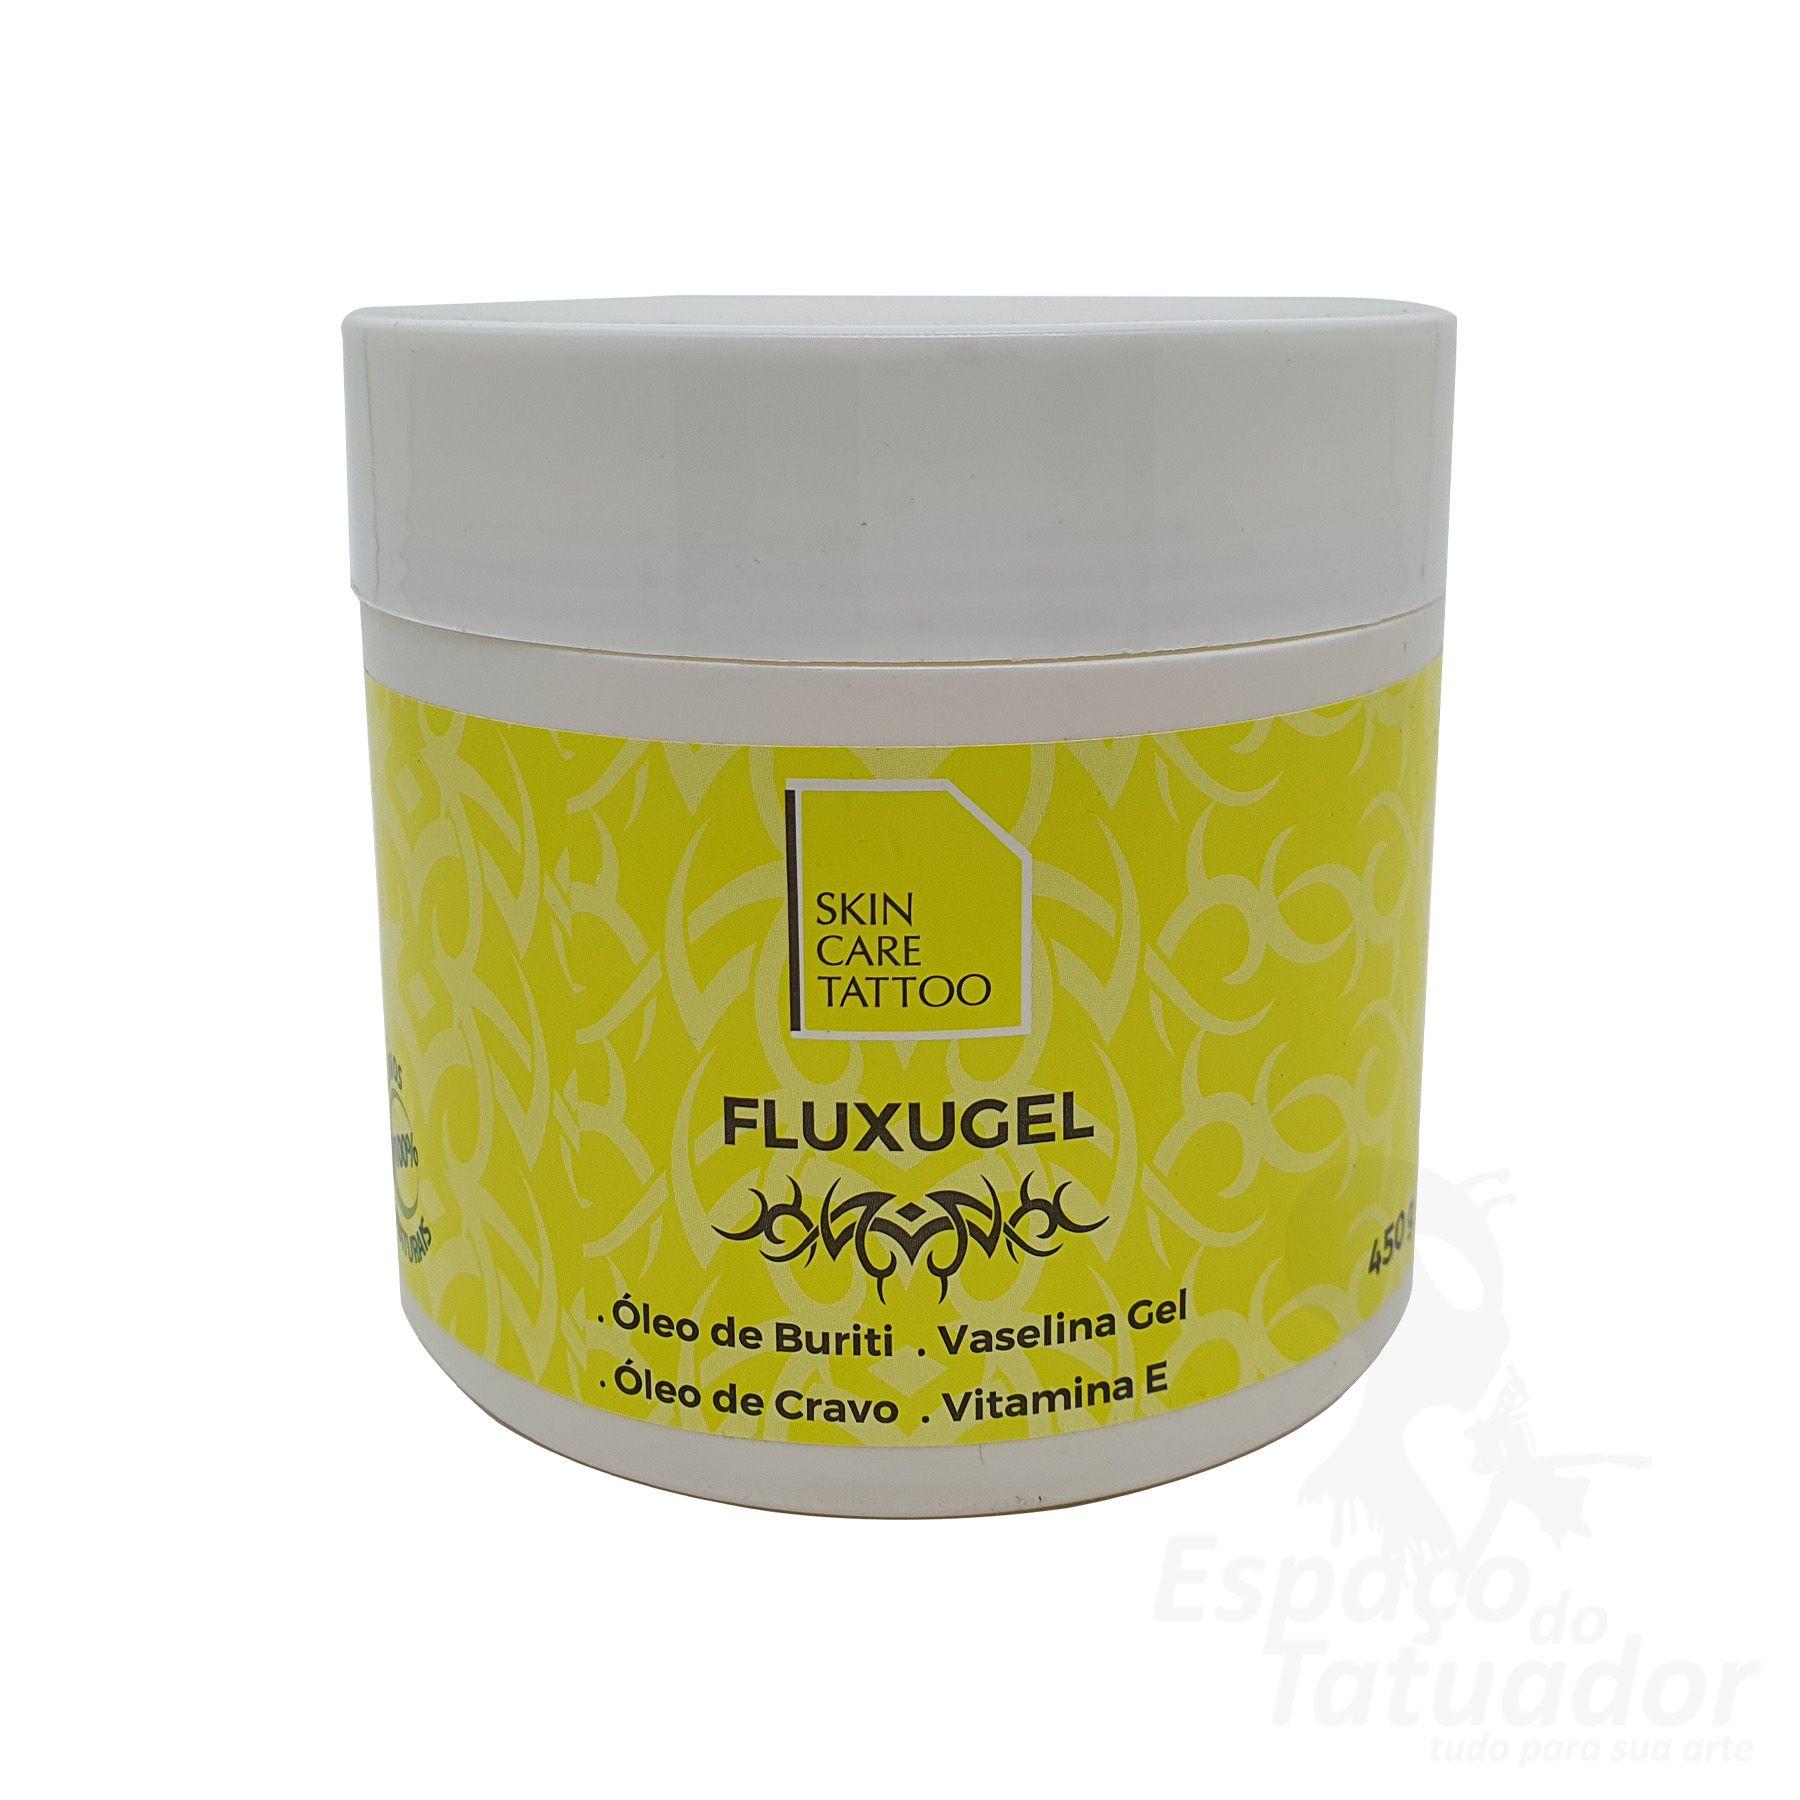 Fluxugel Skin Care - 450g (vál. 12/21)